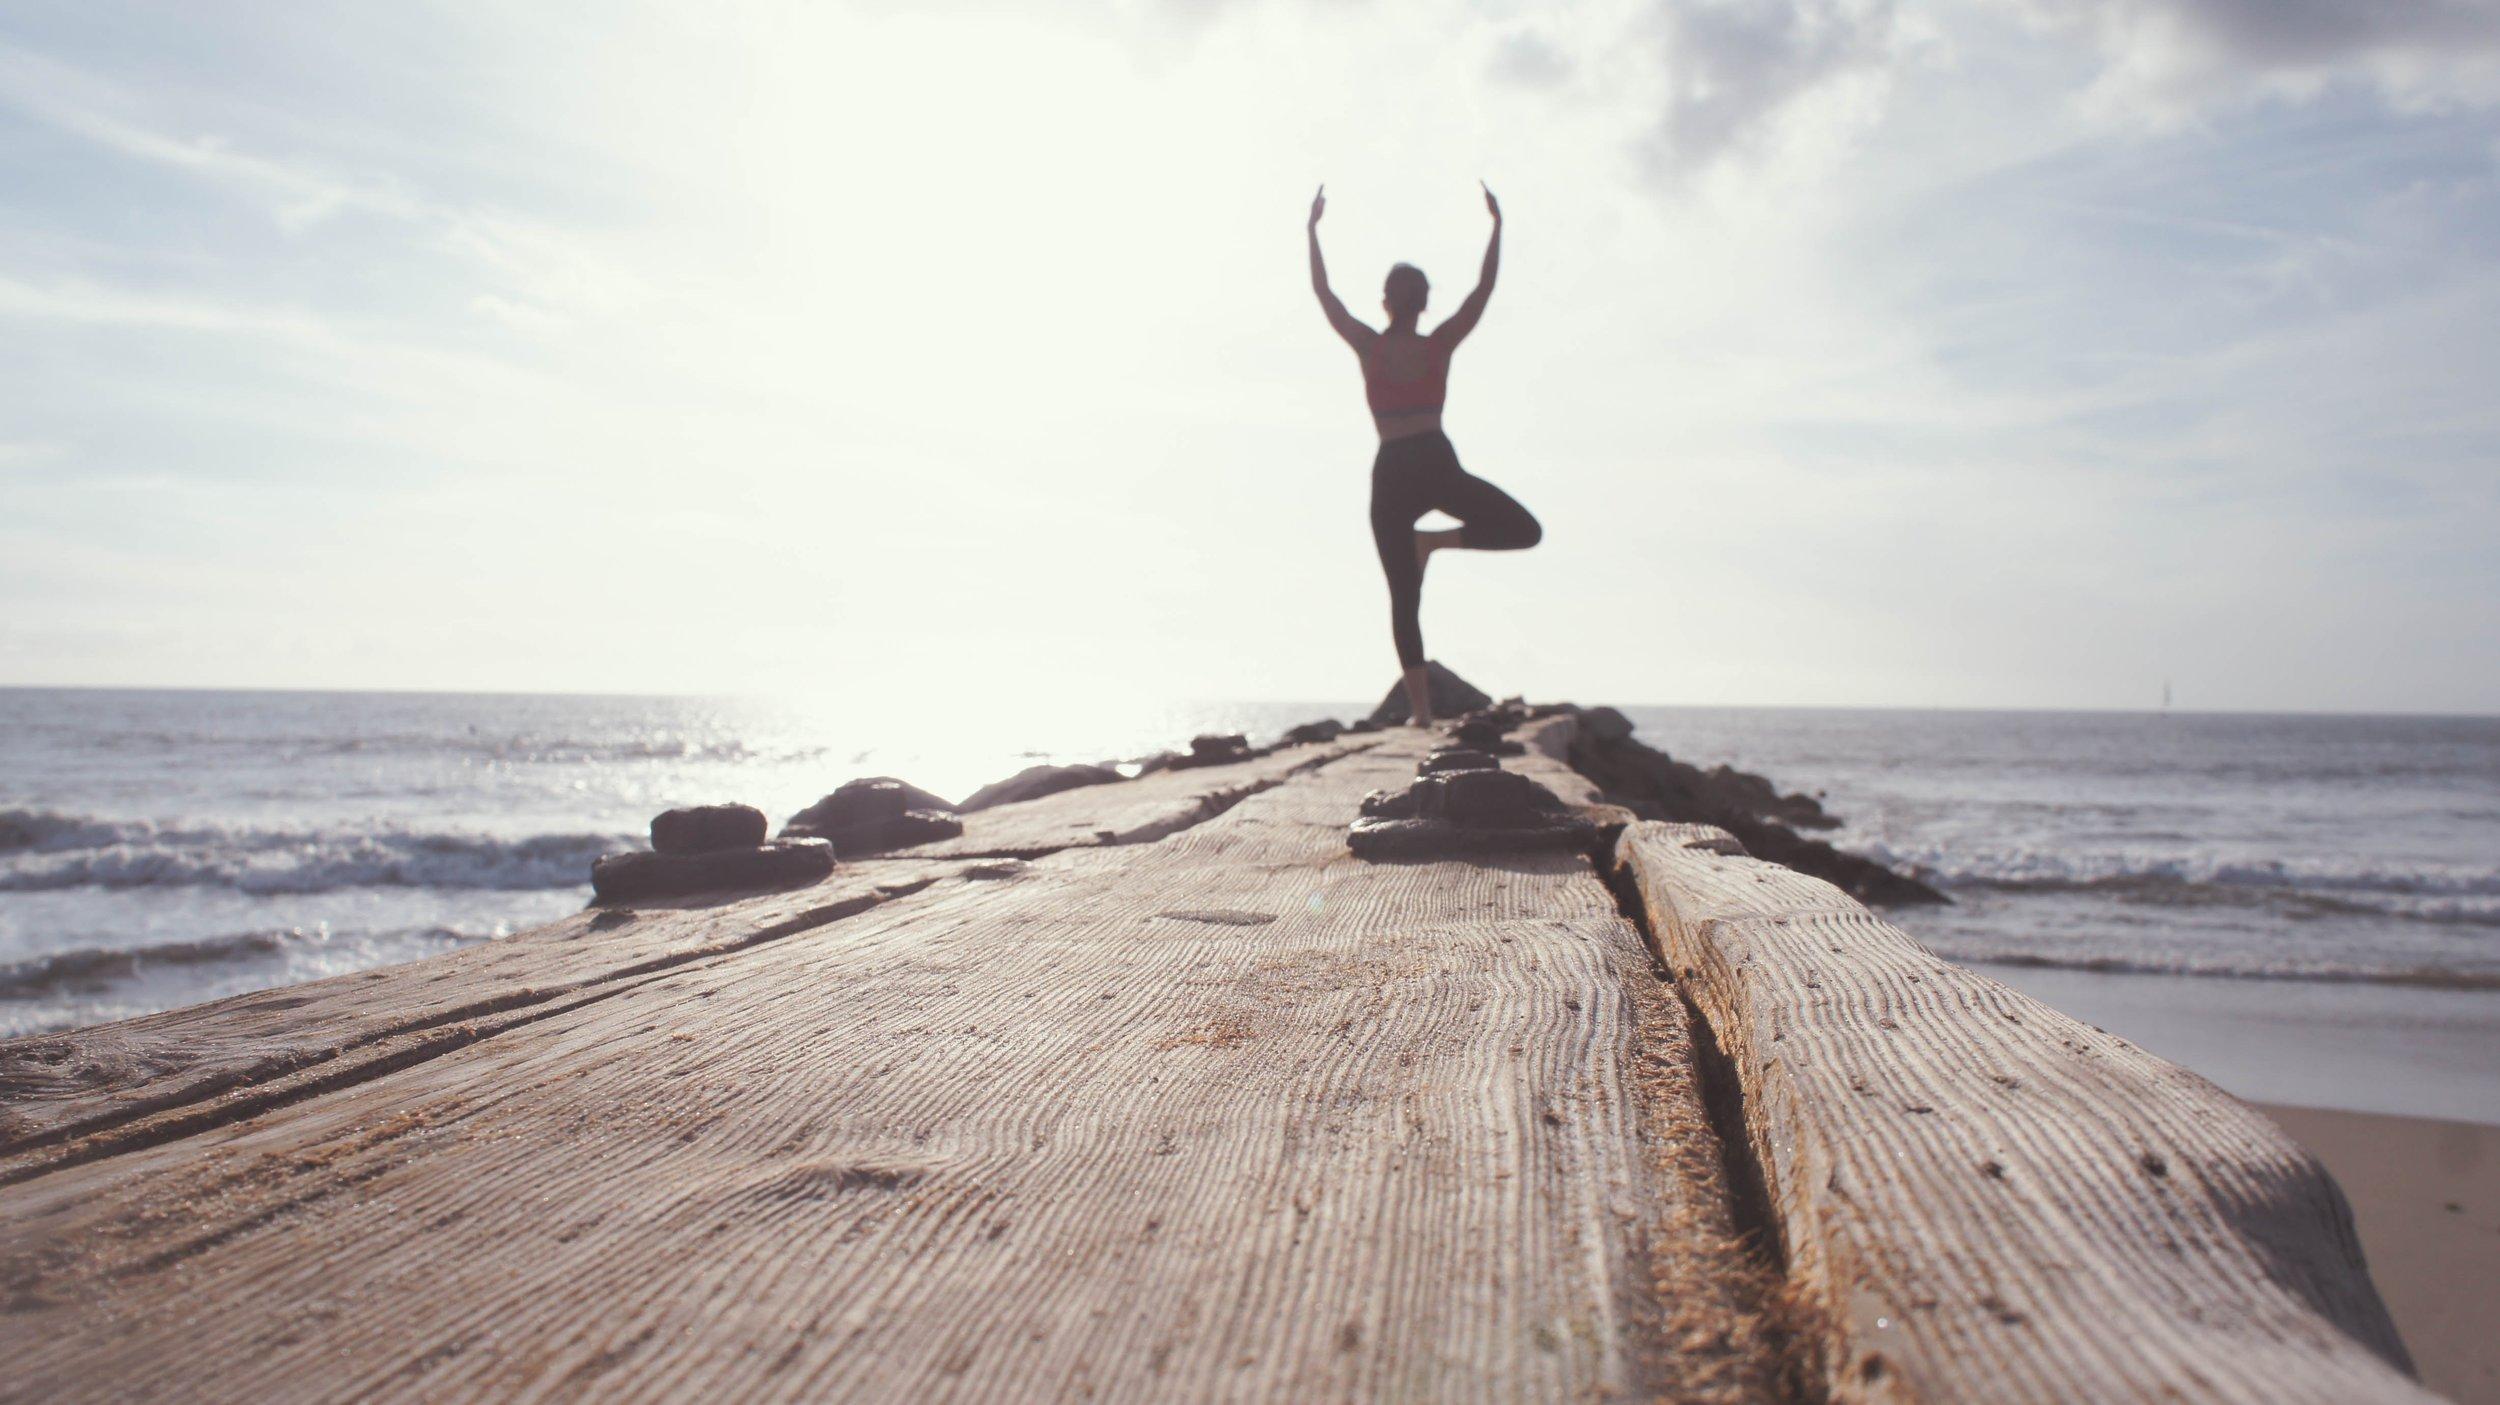 Yoga reduces stress.